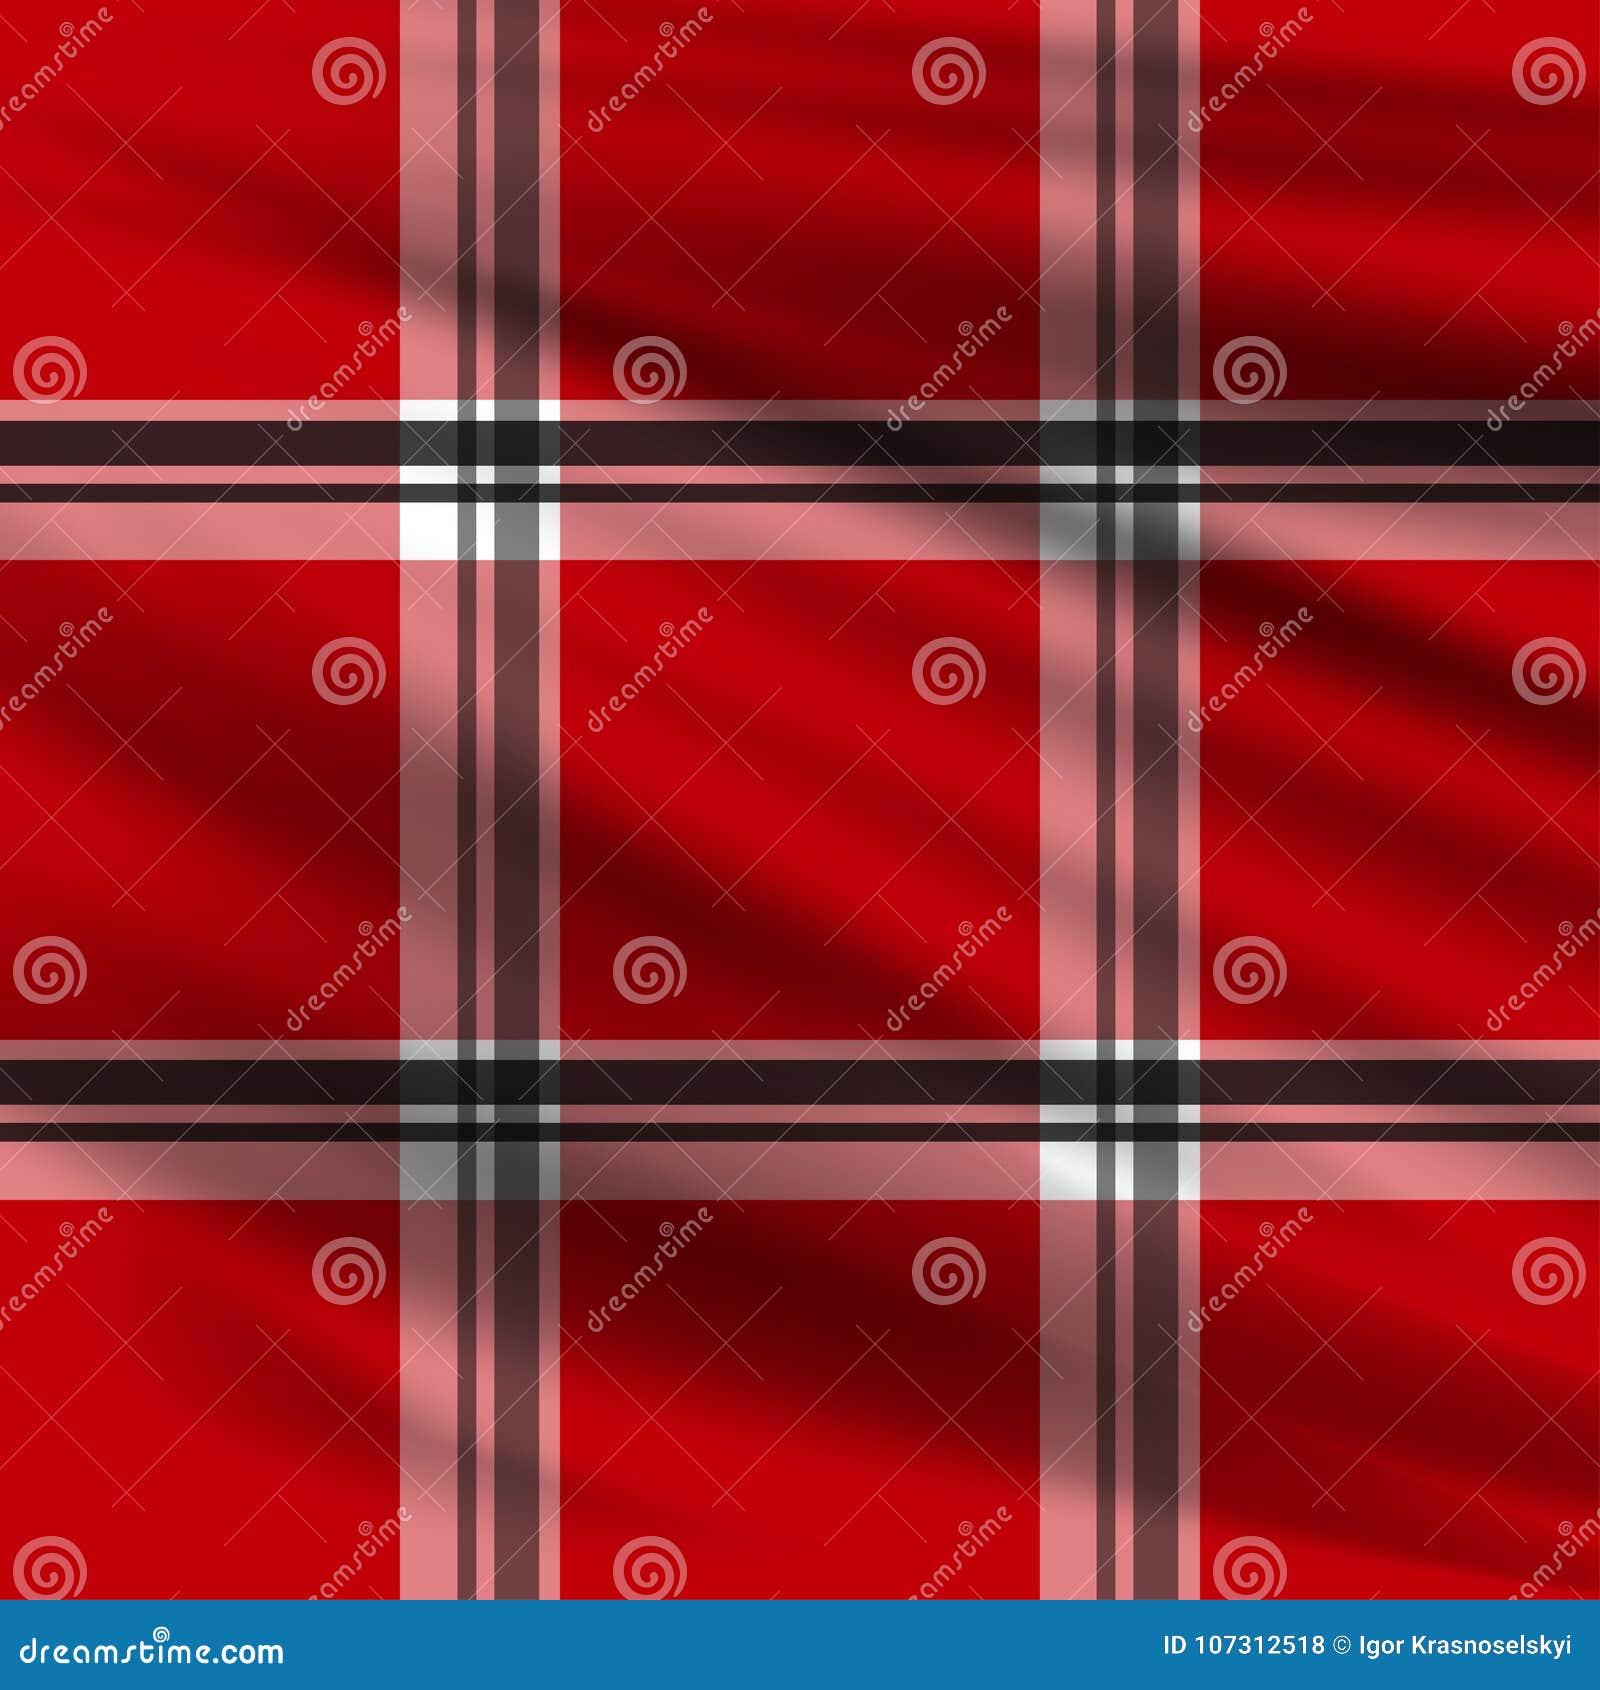 Realistic Lumberjack plaid pattern vector